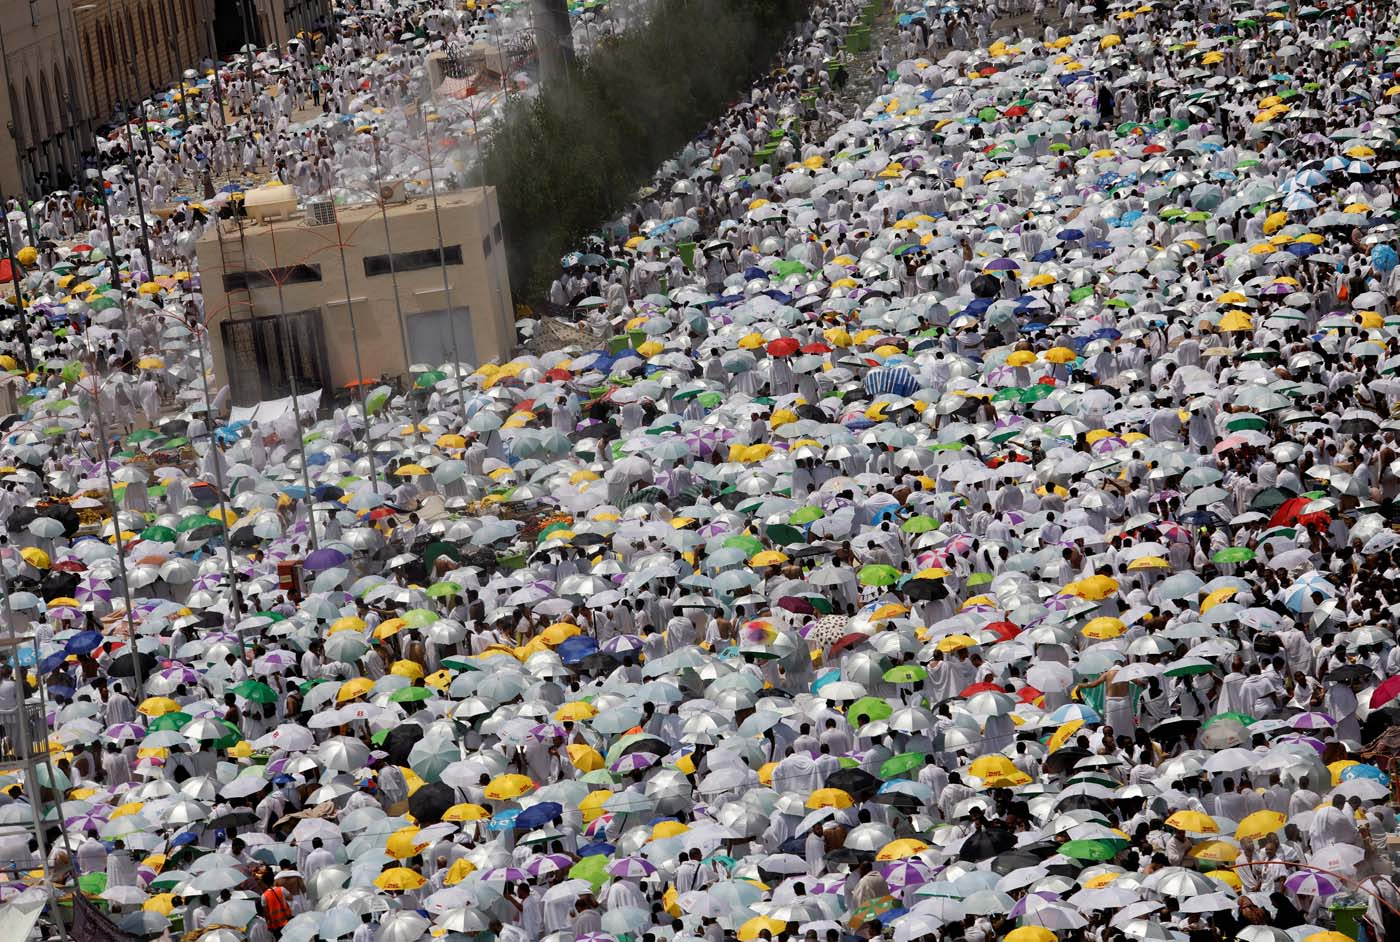 Muslim pilgrims pray outside Namira Mosque on the plains of Arafat during the annual haj pilgrimage, outside the holy city of Mecca, Saudi Arabia August 31, 2017. REUTERS/Suhaib Salem